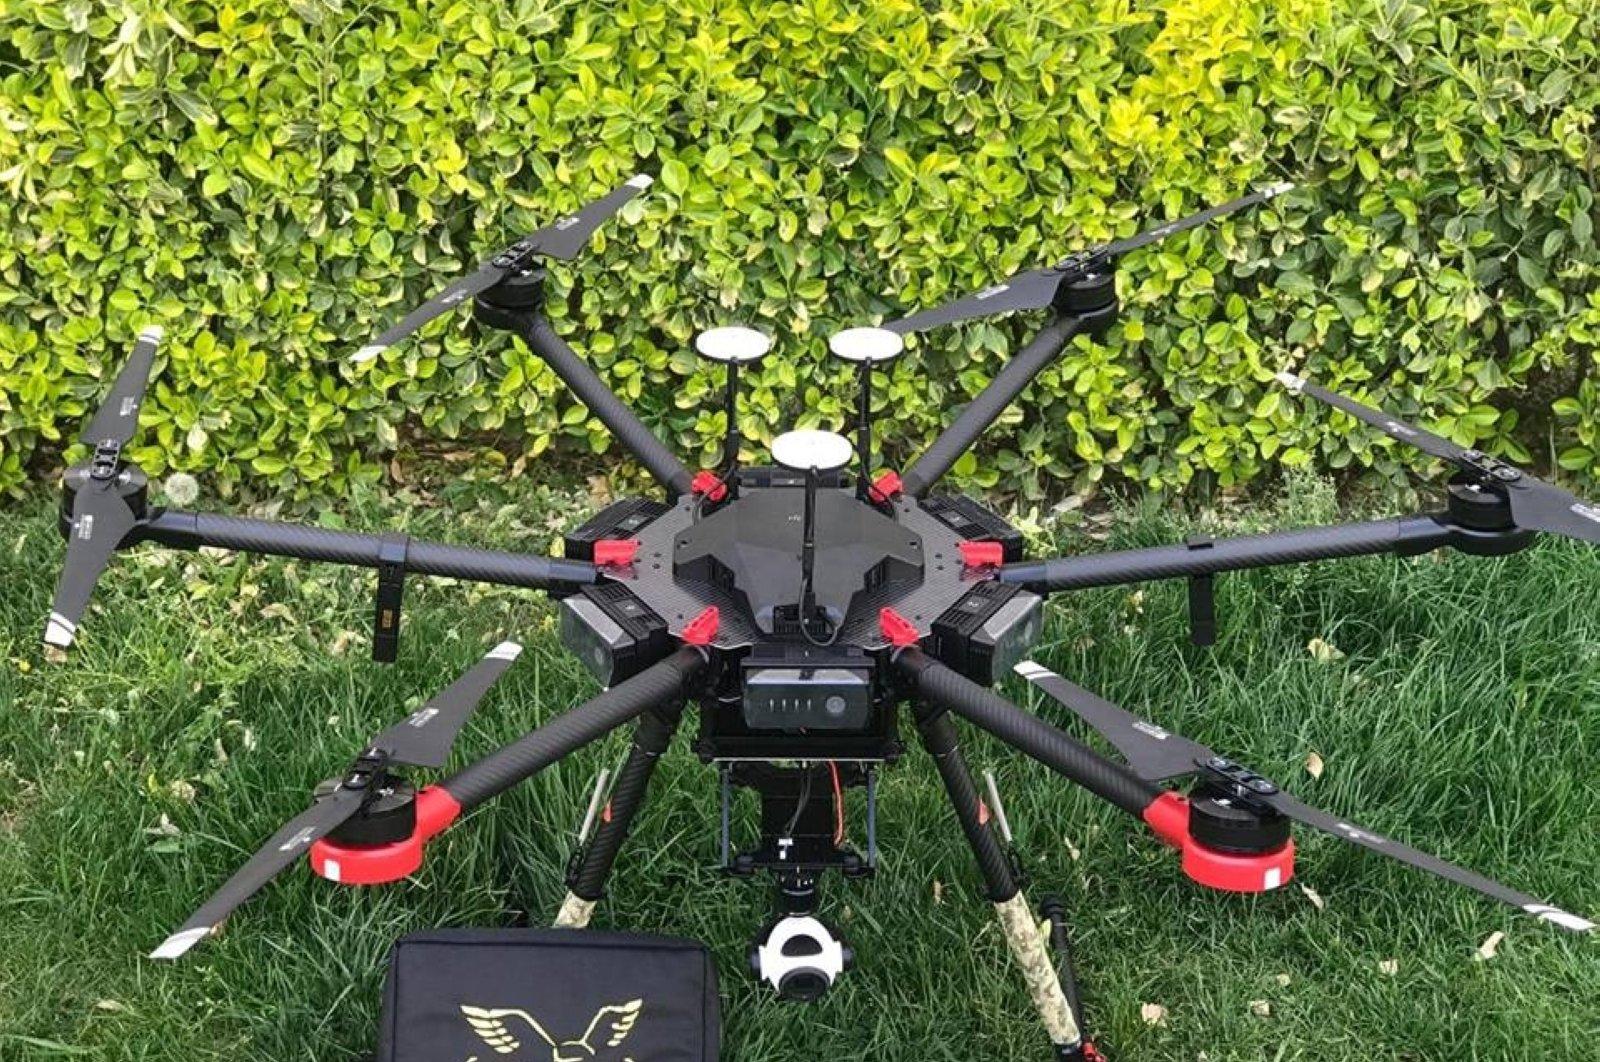 The Proton Elıc RB-128 Drone. (Photo courtesy of Assuva Defense)